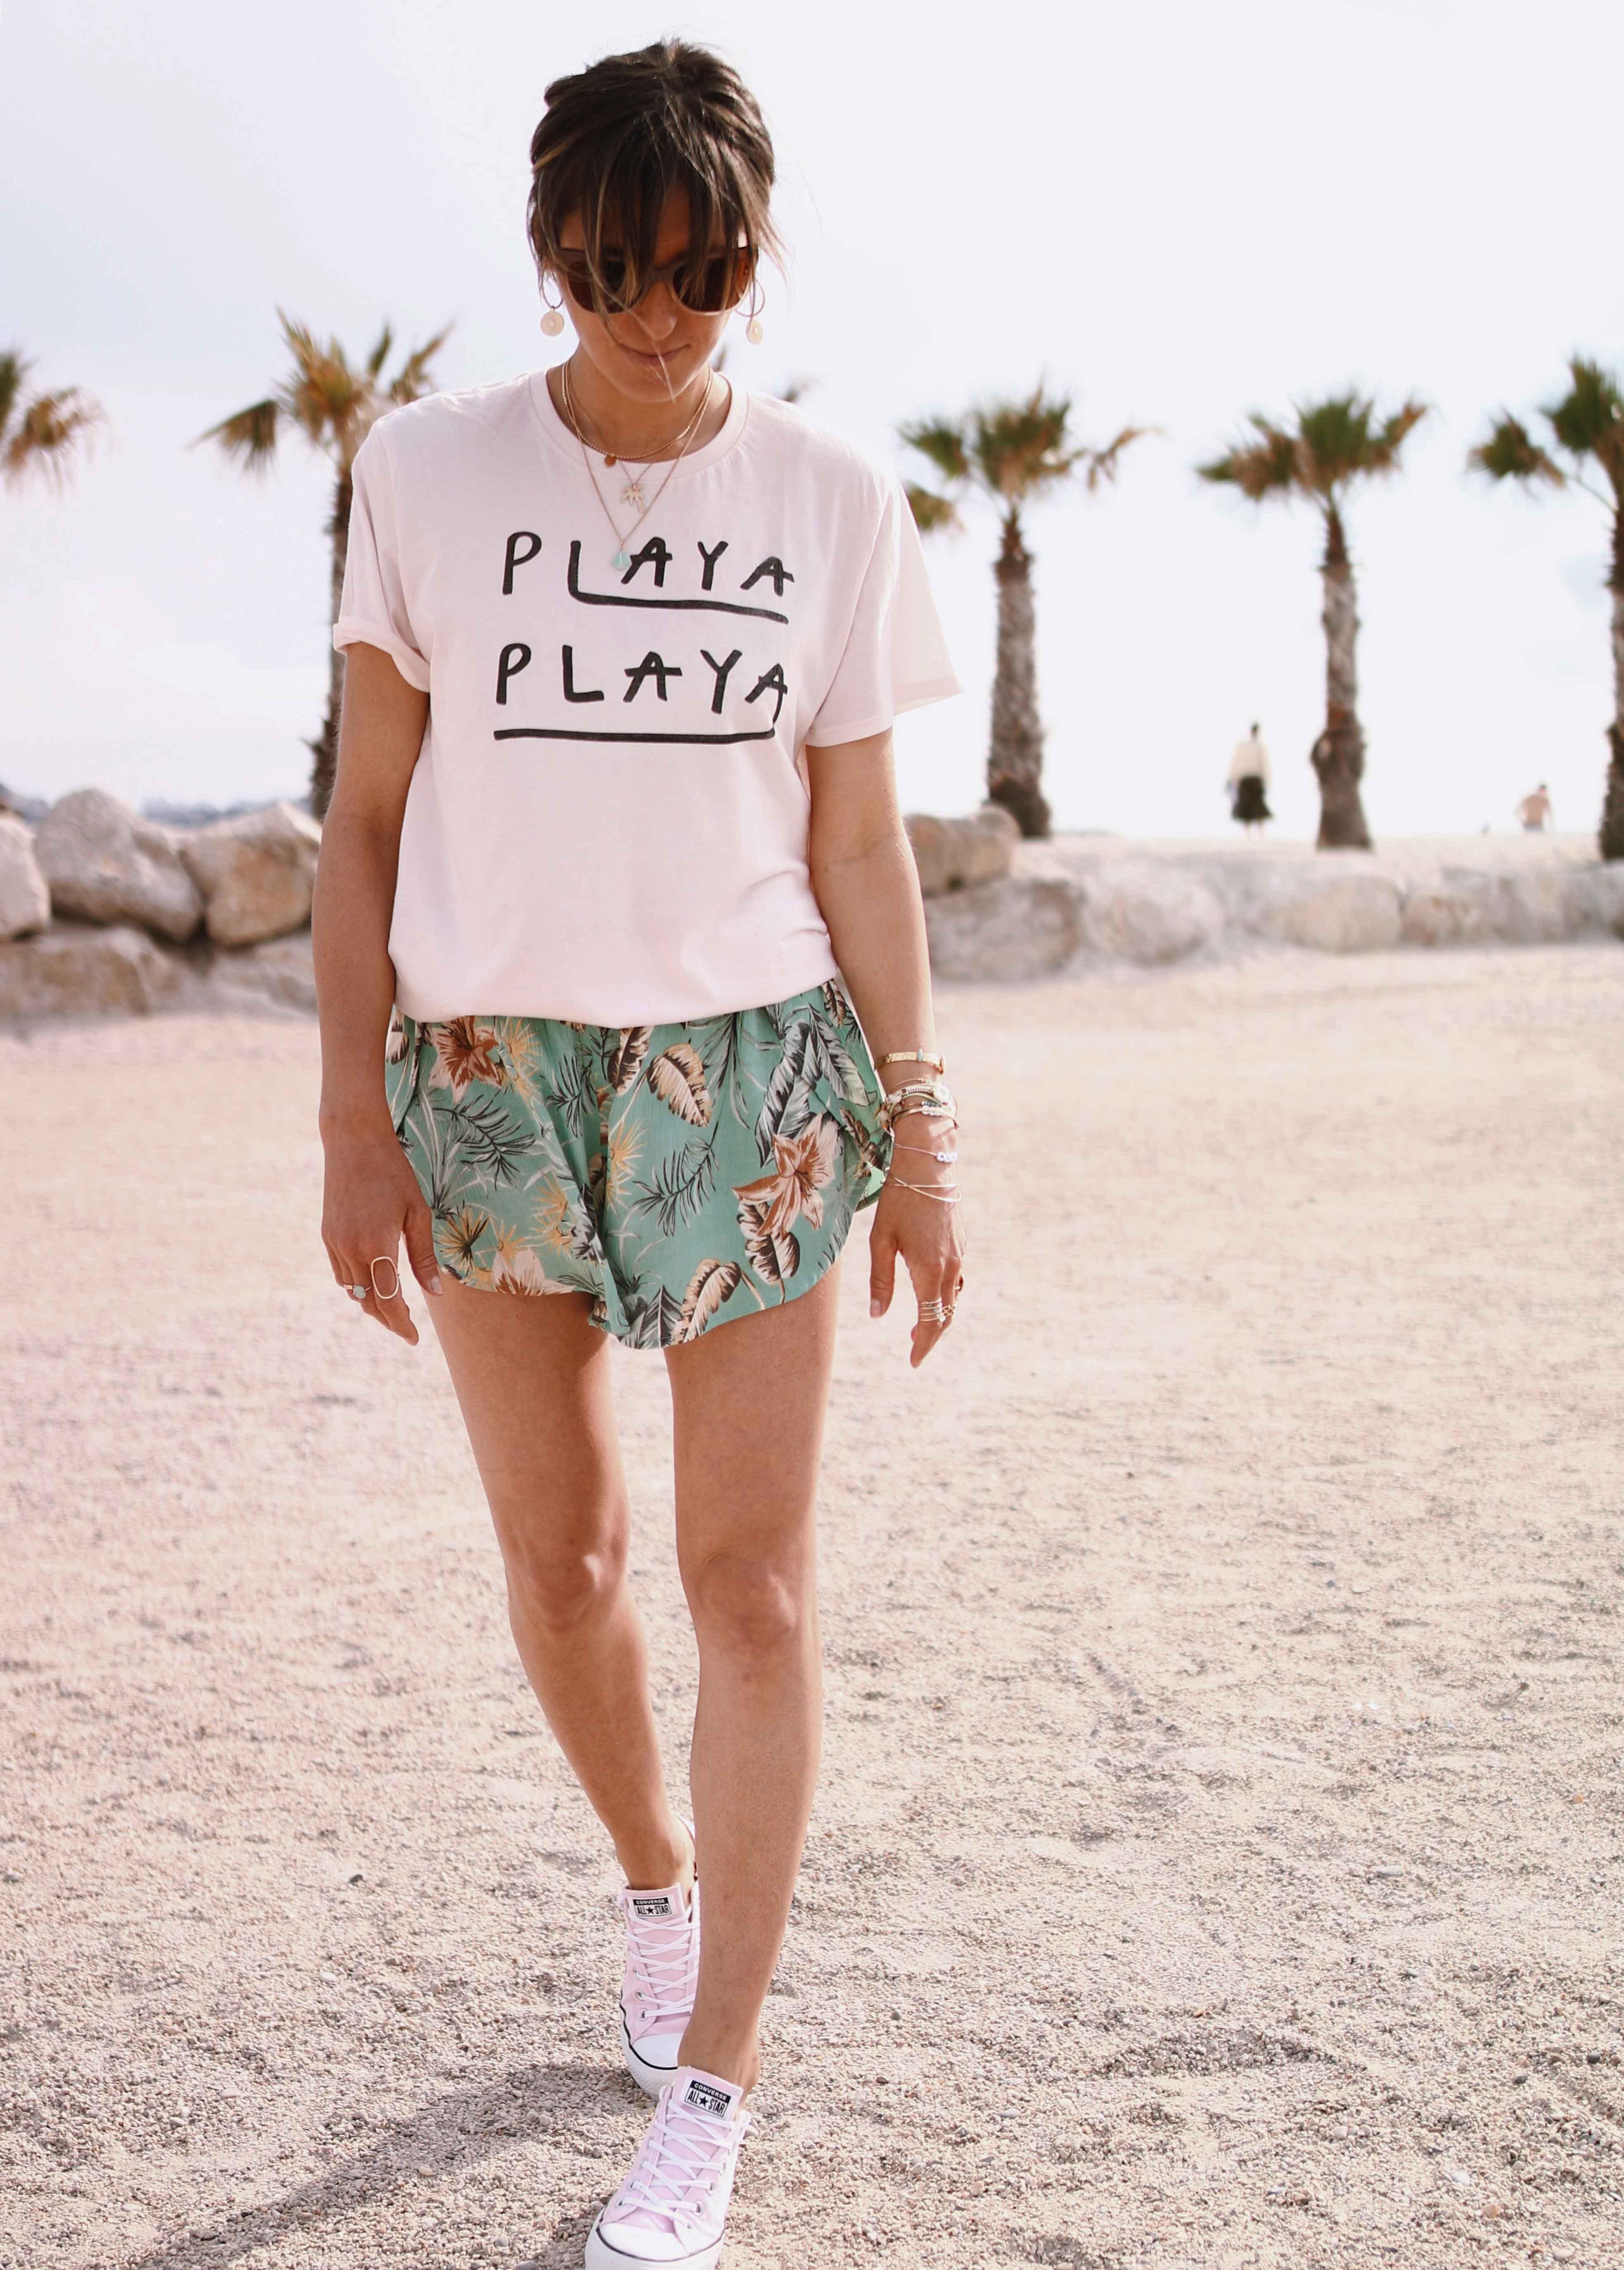 Chon & CHON - www.chonandchon.com - PLAYA PLAYA - t-shirt amuse society playa playa, short plage fleuri, beach look, casual style